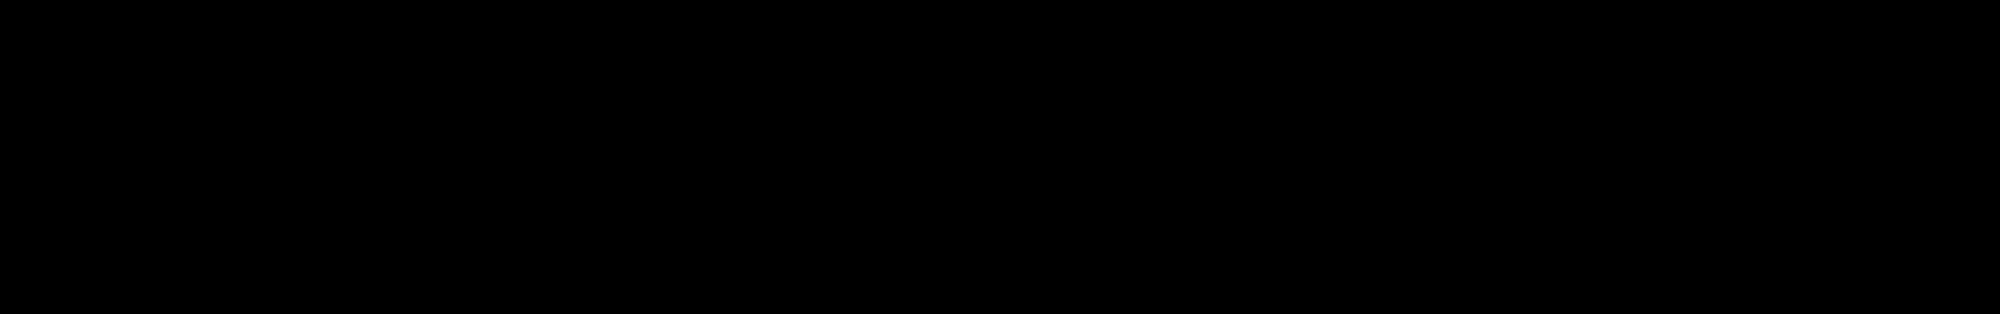 REVOLVING ON THE ROAD-logo-black.png